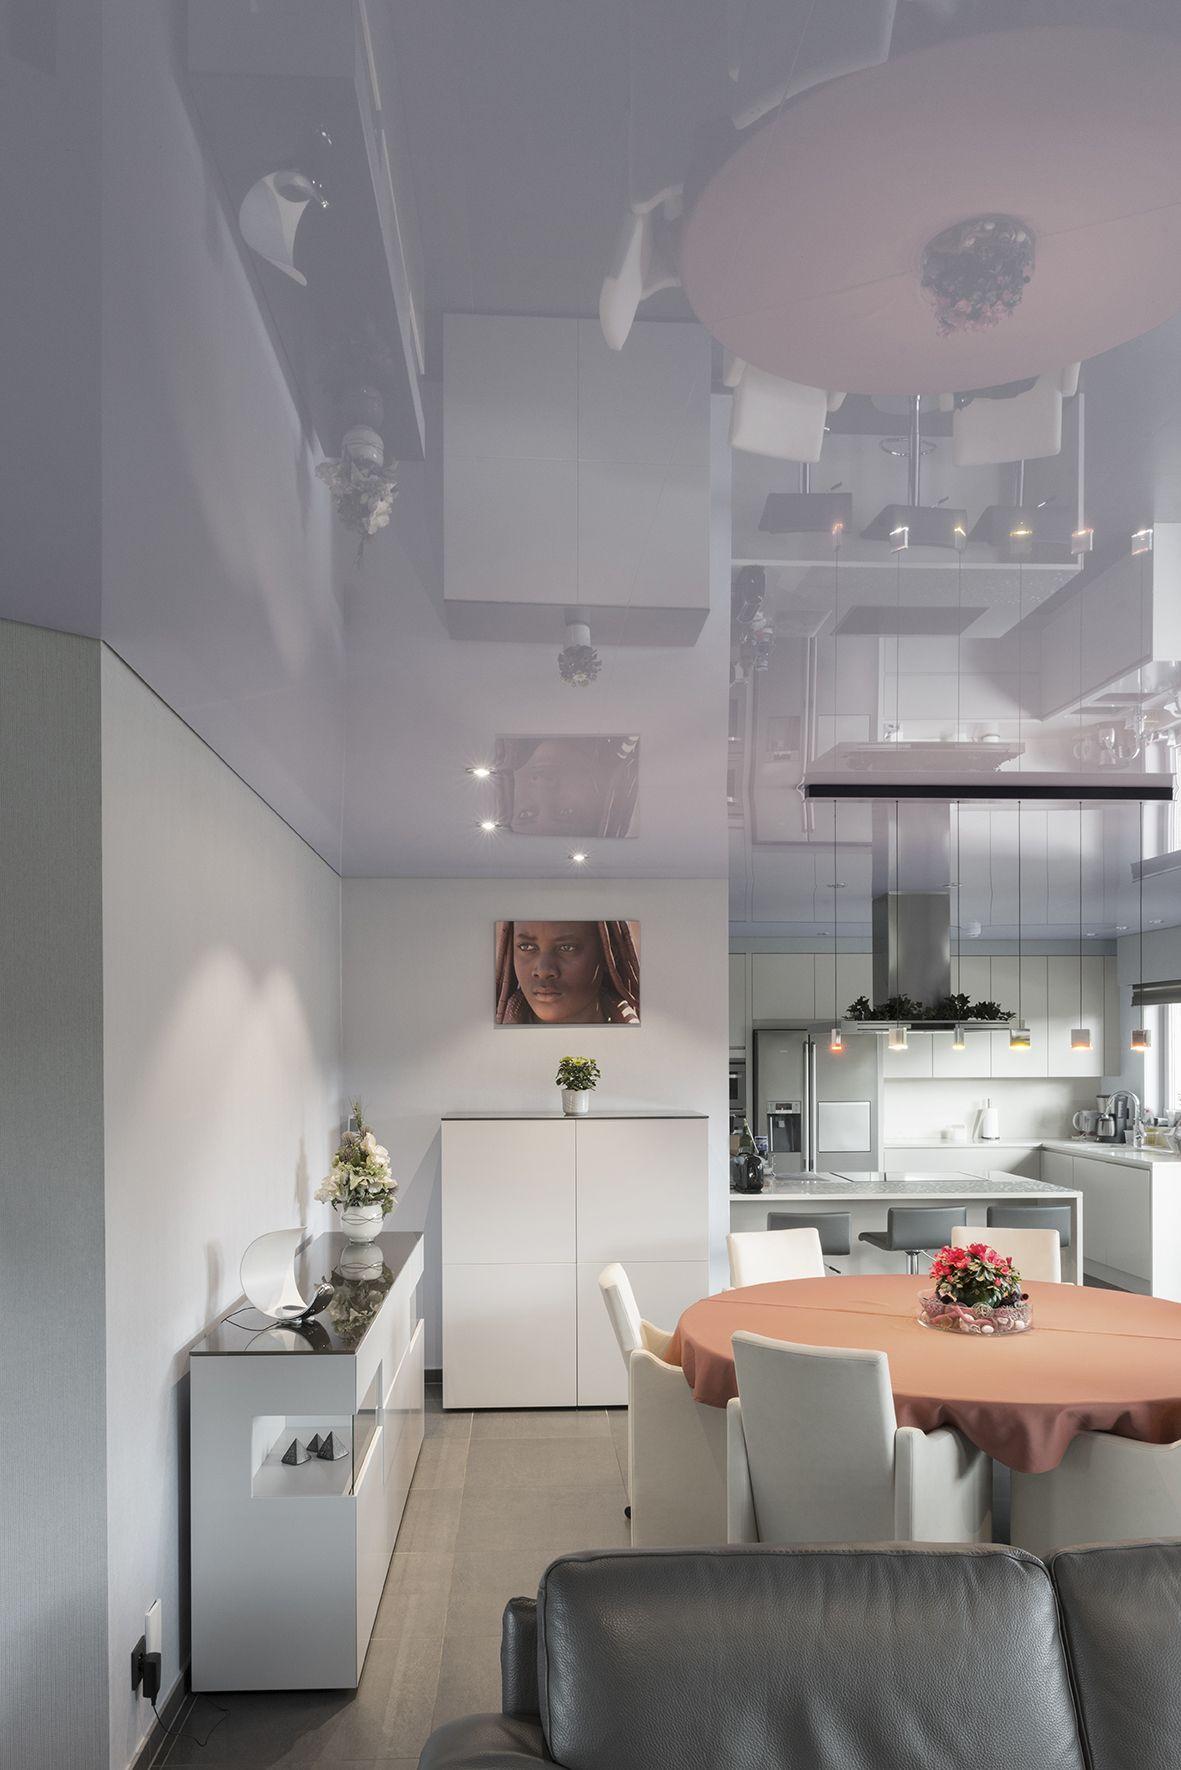 Nice Extenzo Spanplafond Stretch Ceiling Plafonds Tendus Techos tensados Spanndecken extenzo